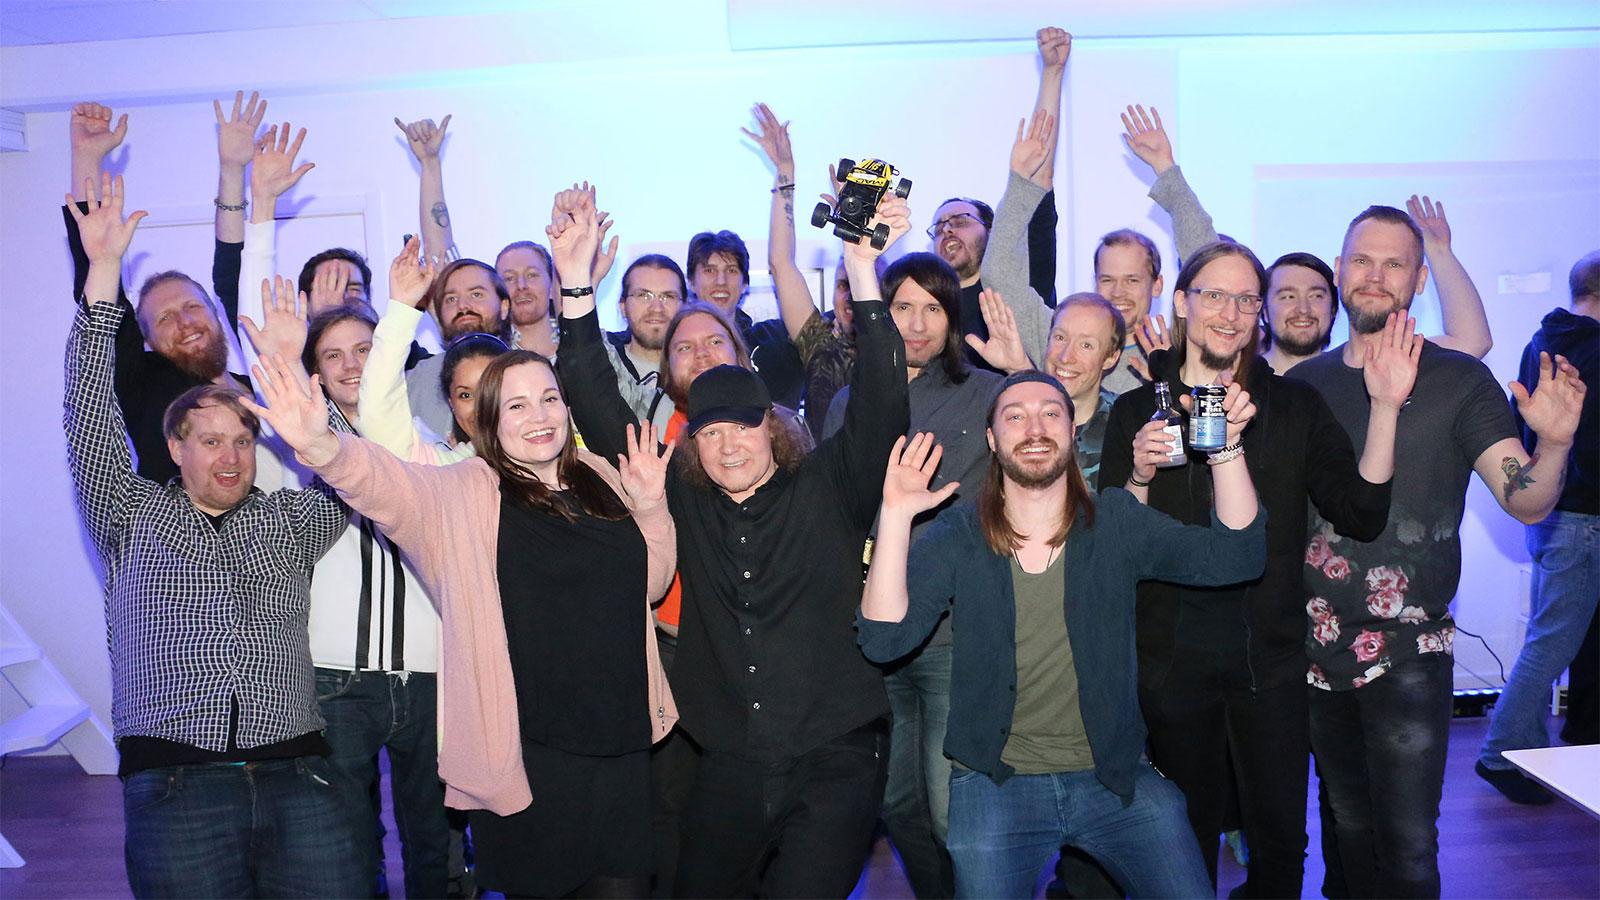 Zordix firar sina många segrar. Foto: Mikael Hansson.